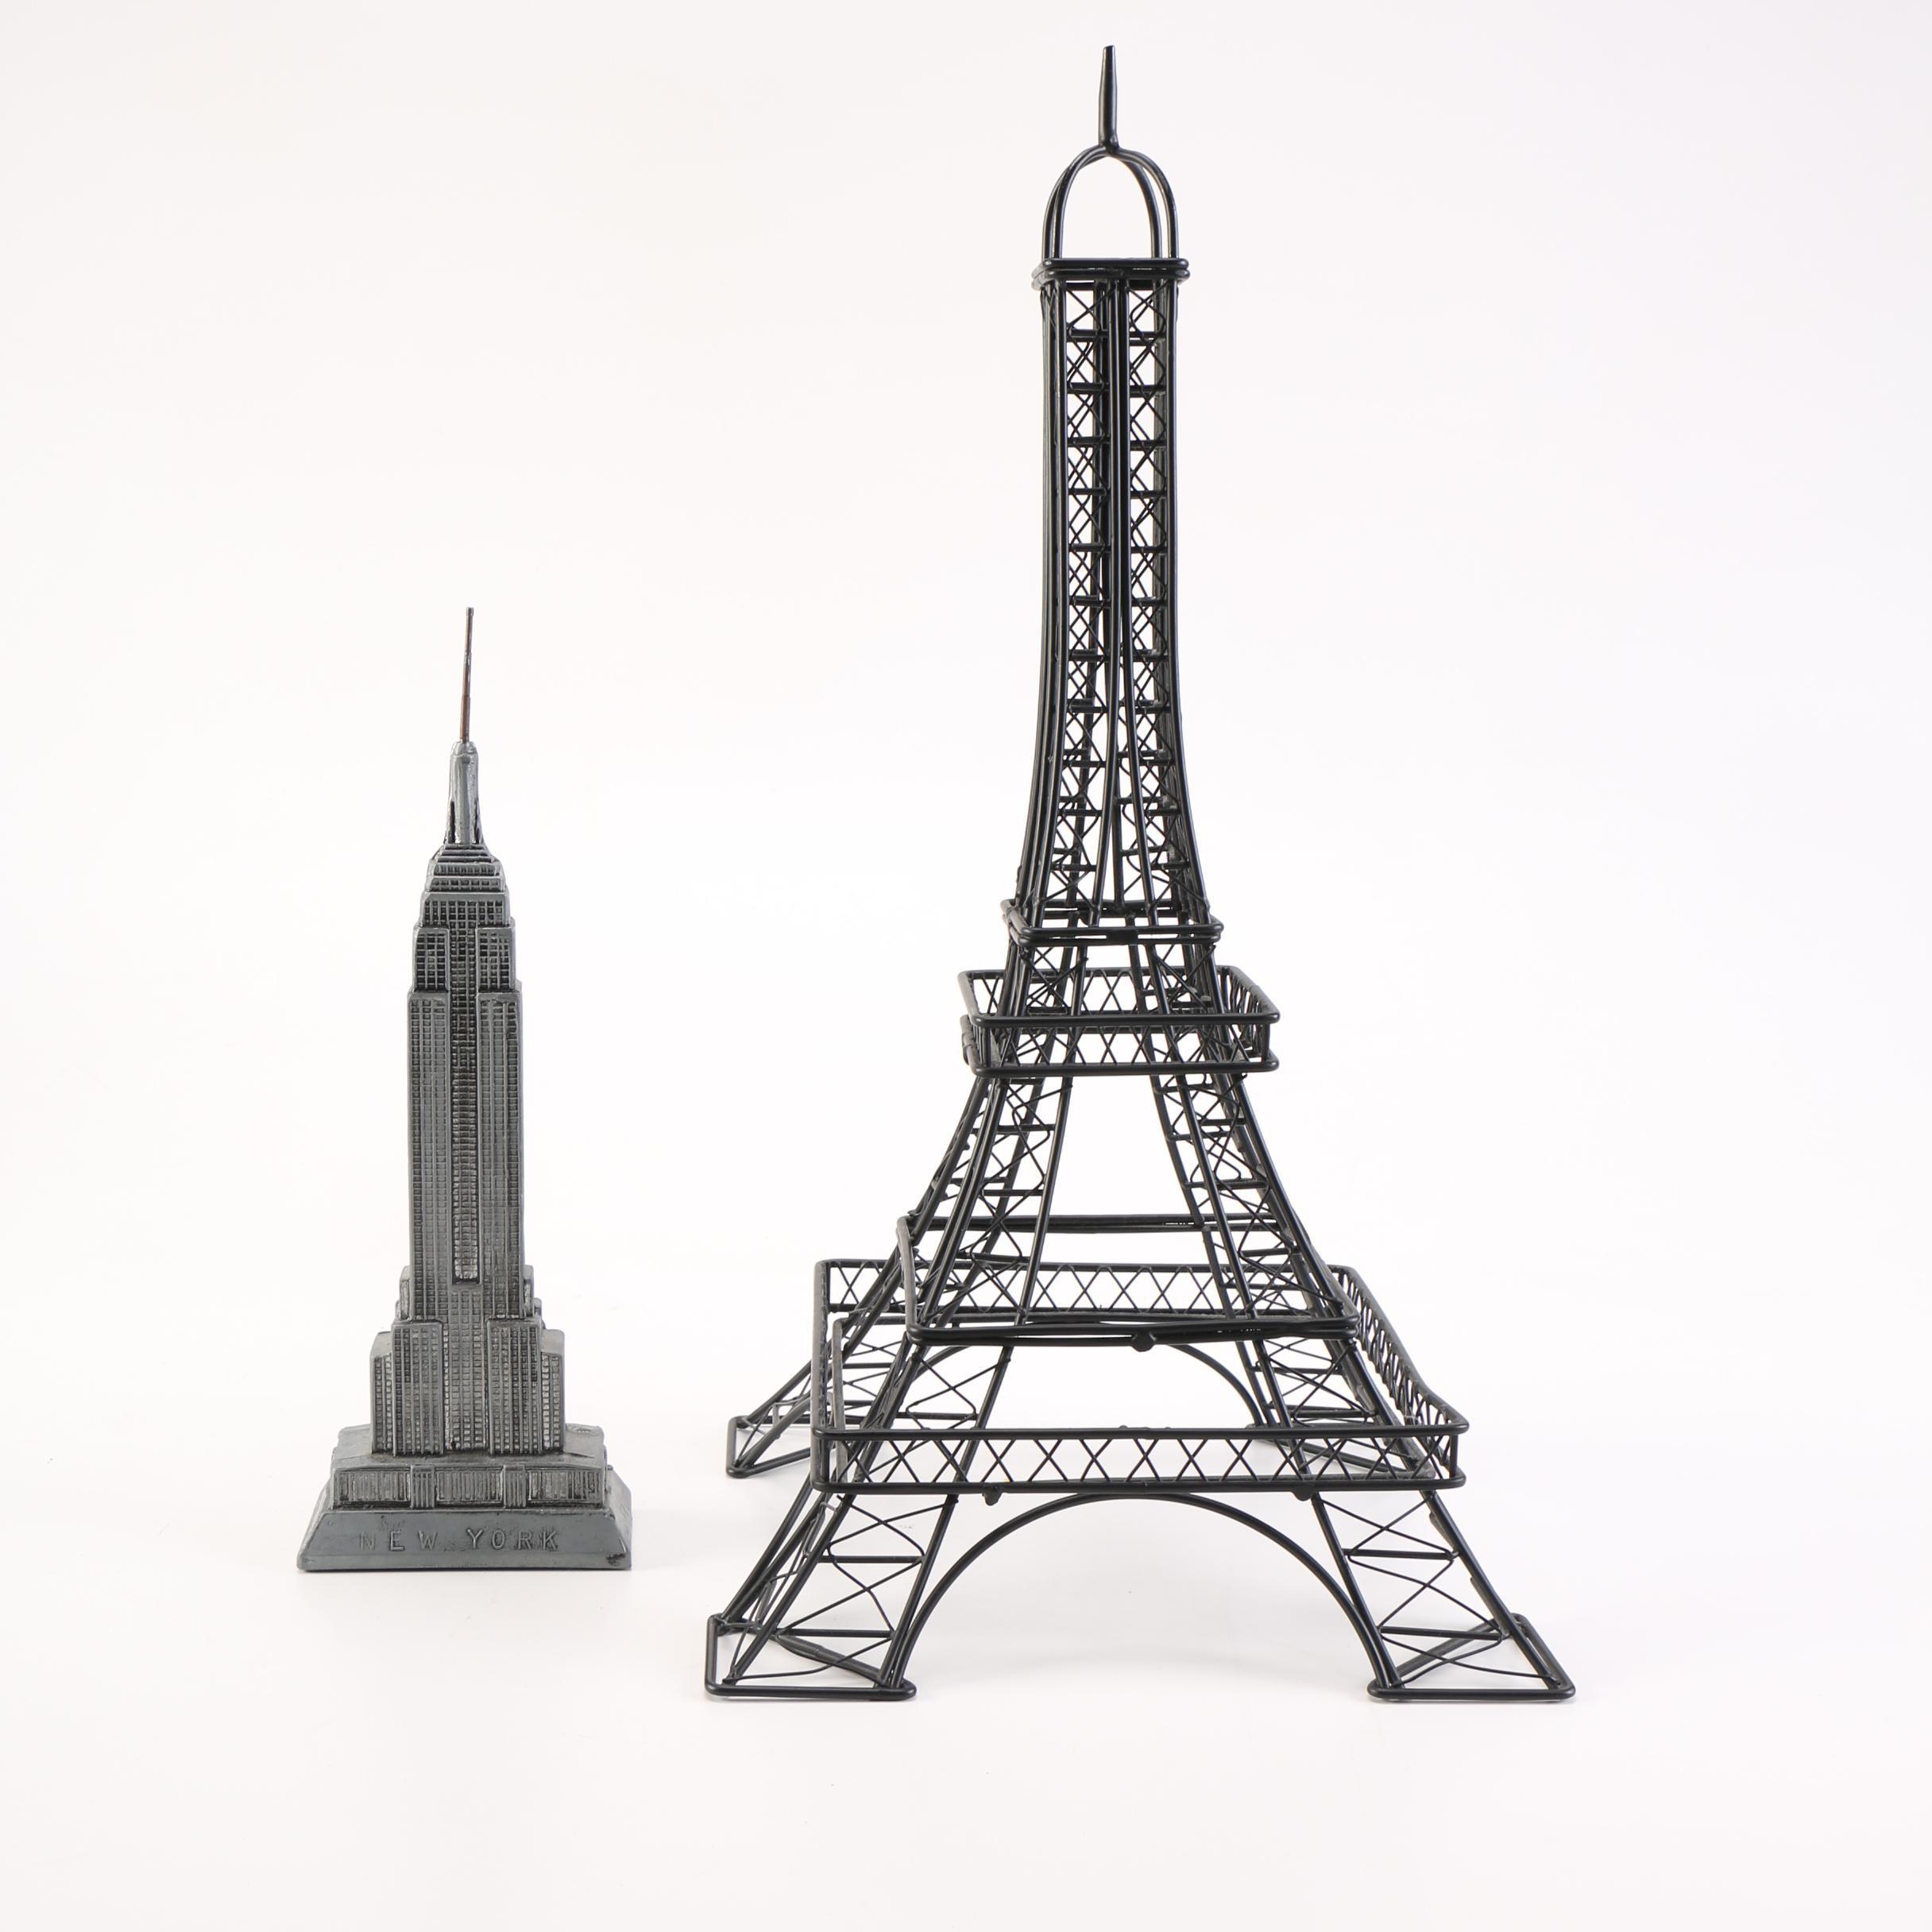 Metal Landmark Figures